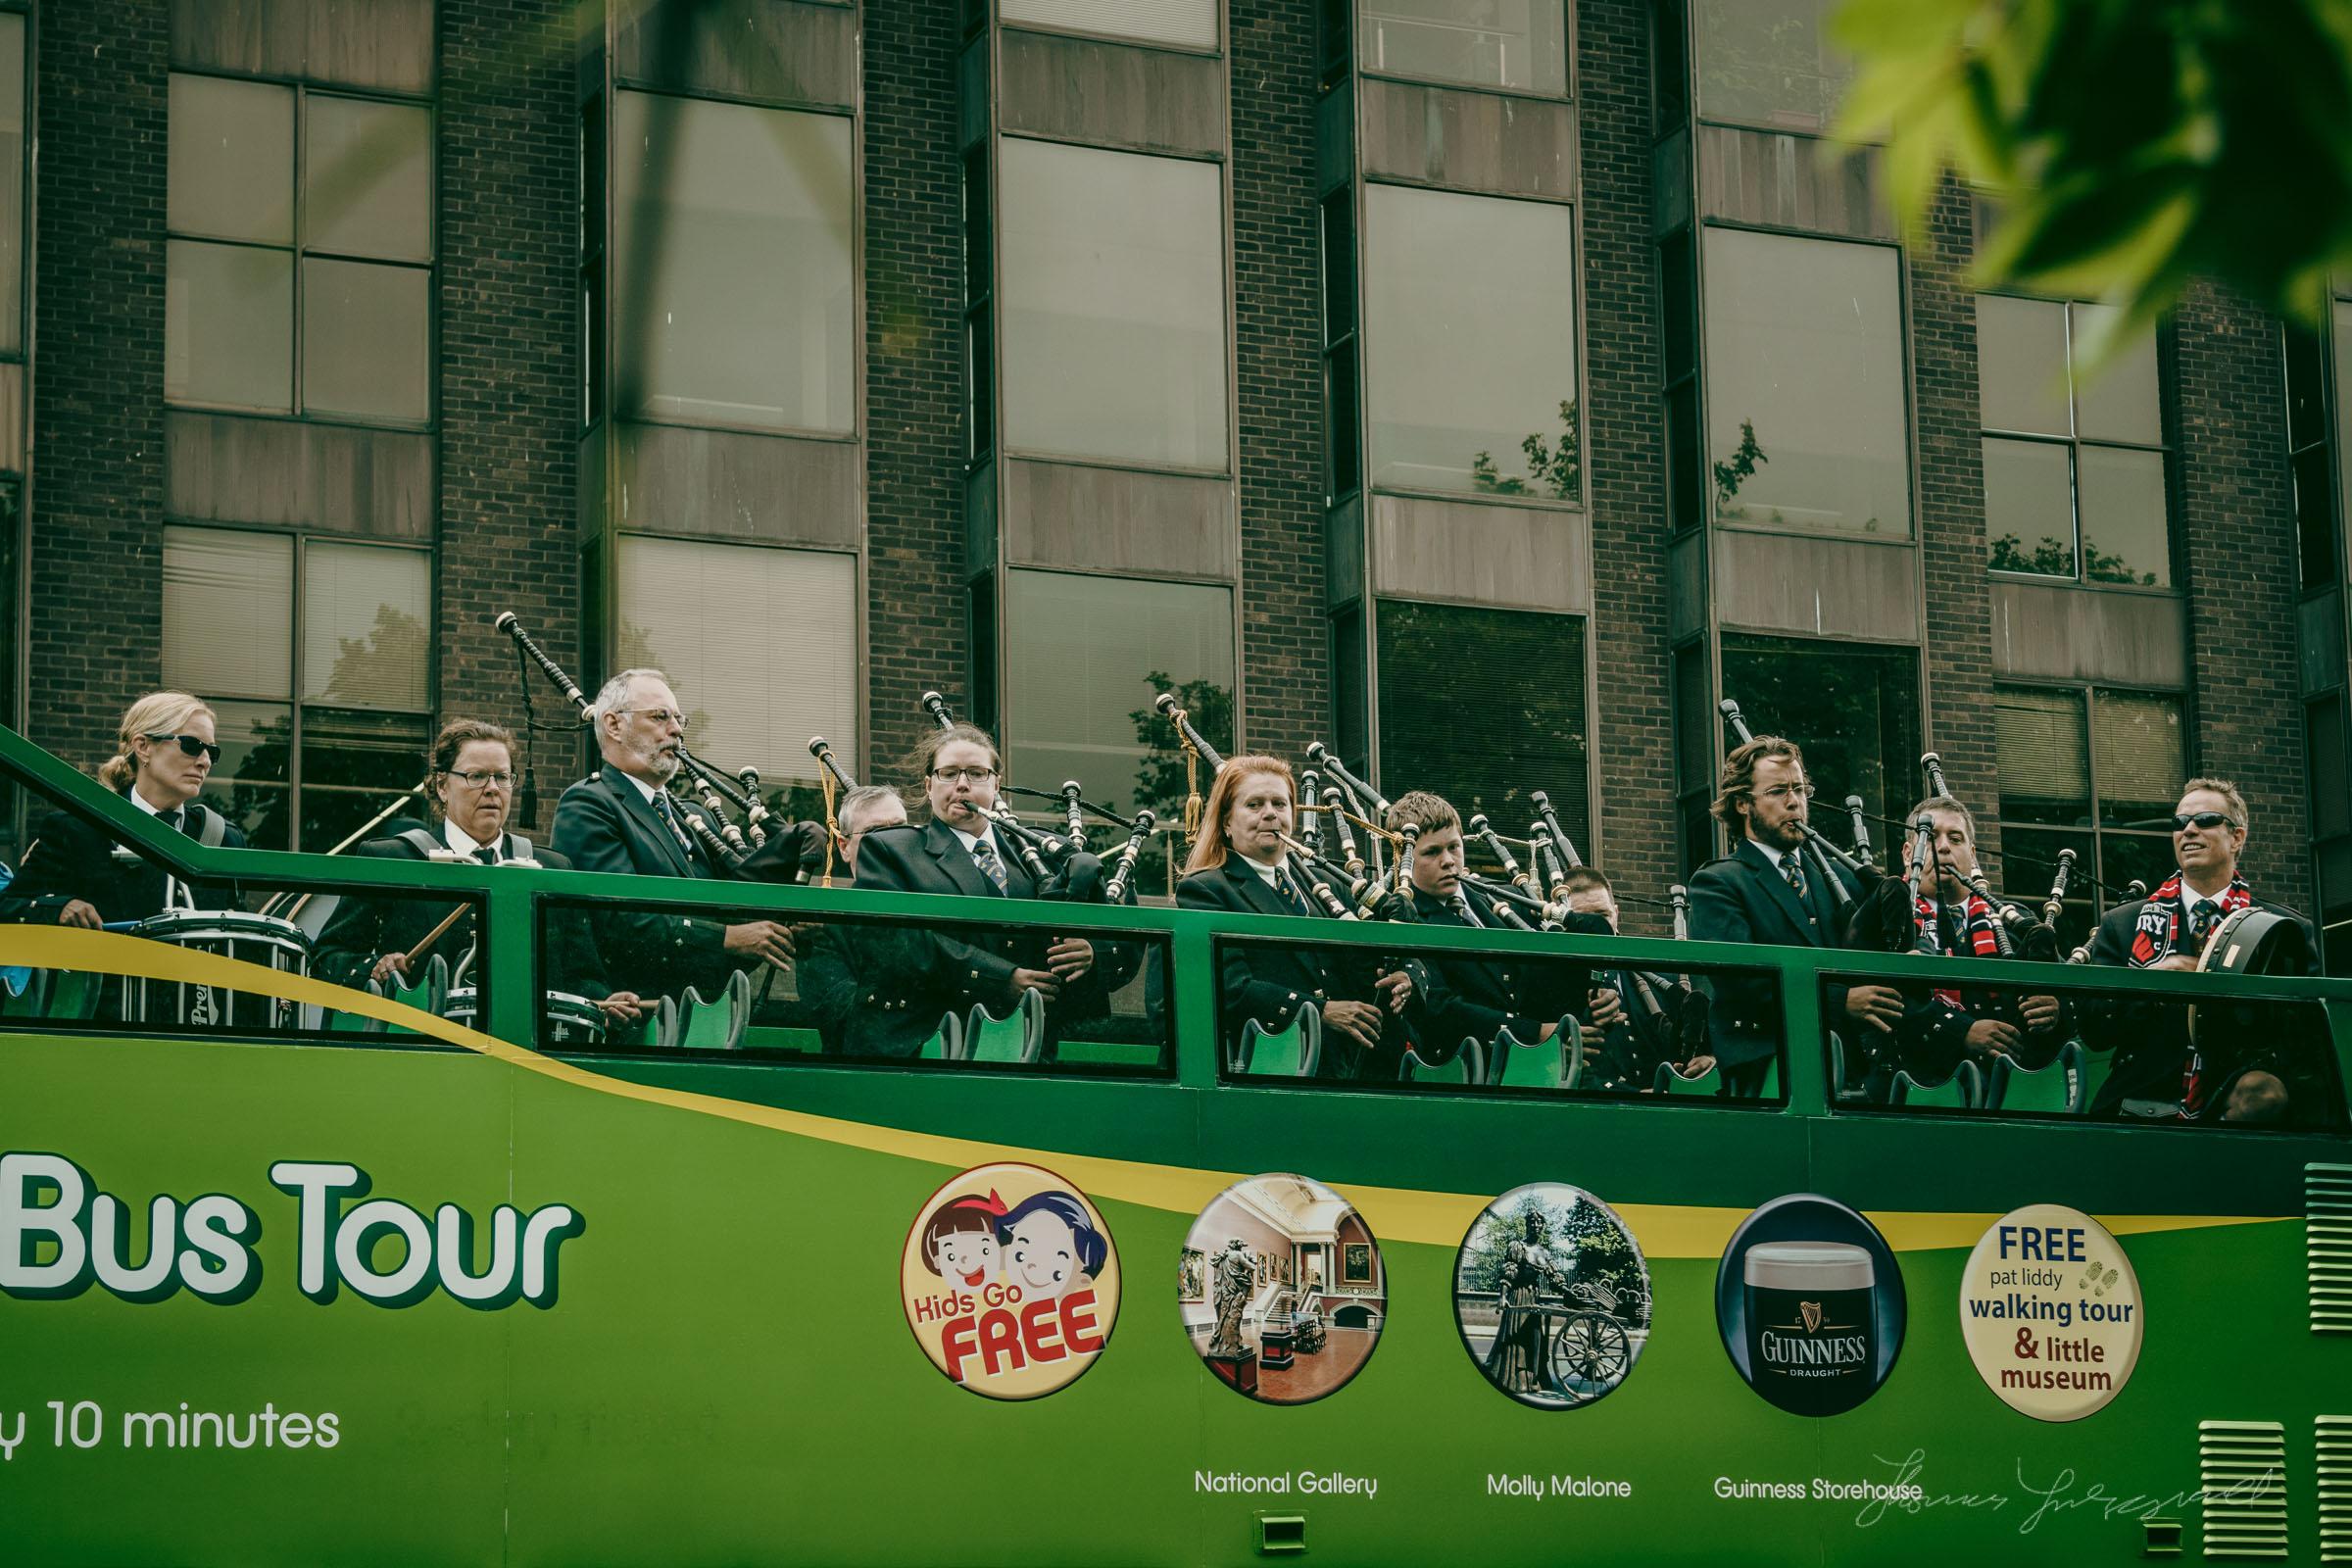 Streets-of-Dublin-Photo-04726.jpg